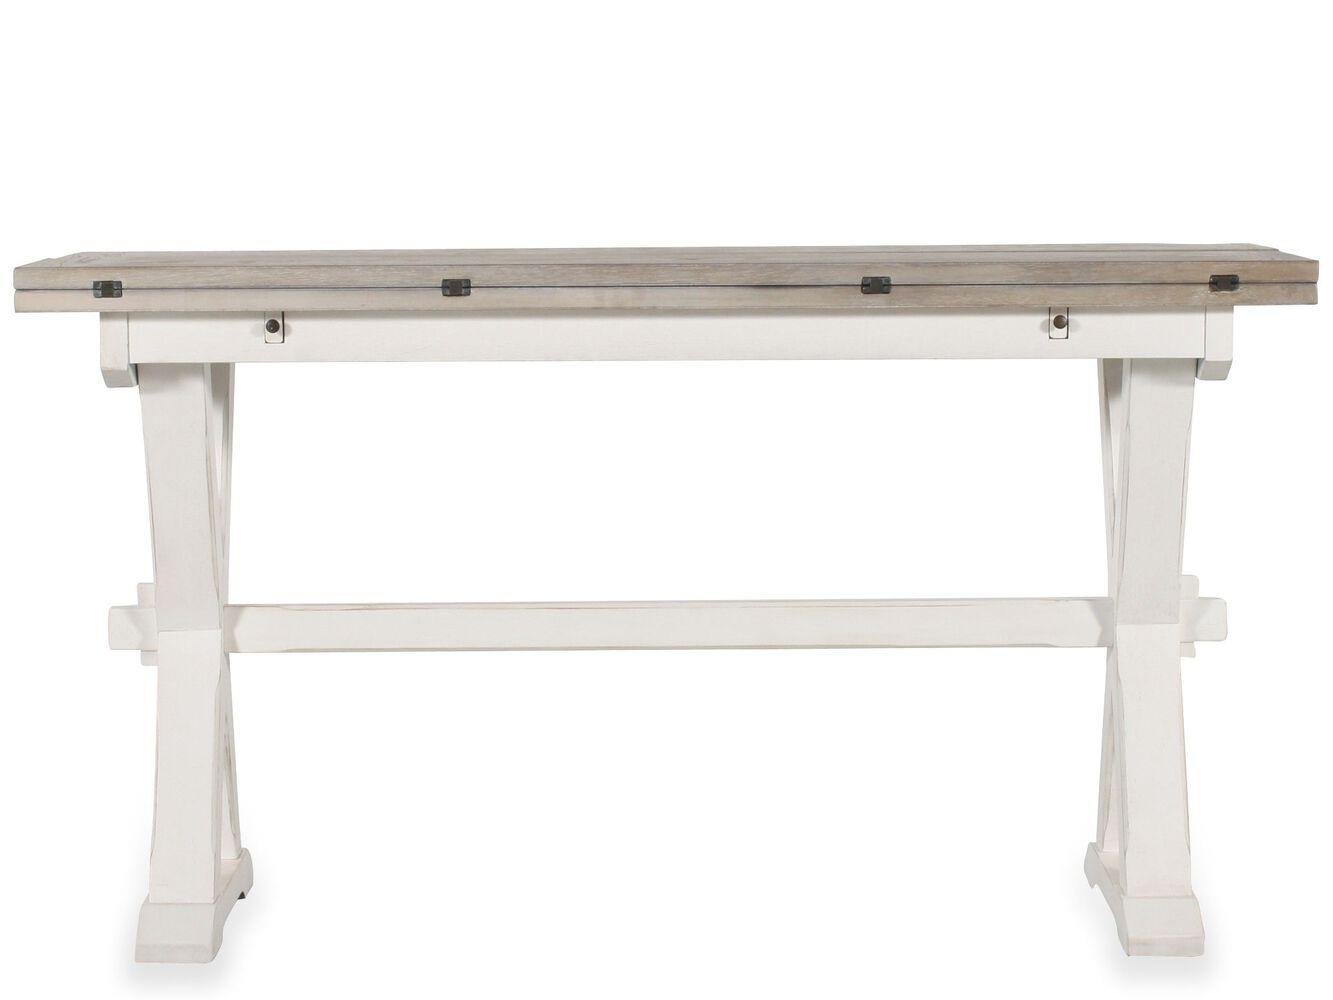 Drop Leaf Sofa Table TheSofa : UNIV 1285E047816 from thesofa.droogkast.com size 1333 x 1000 jpeg 40kB